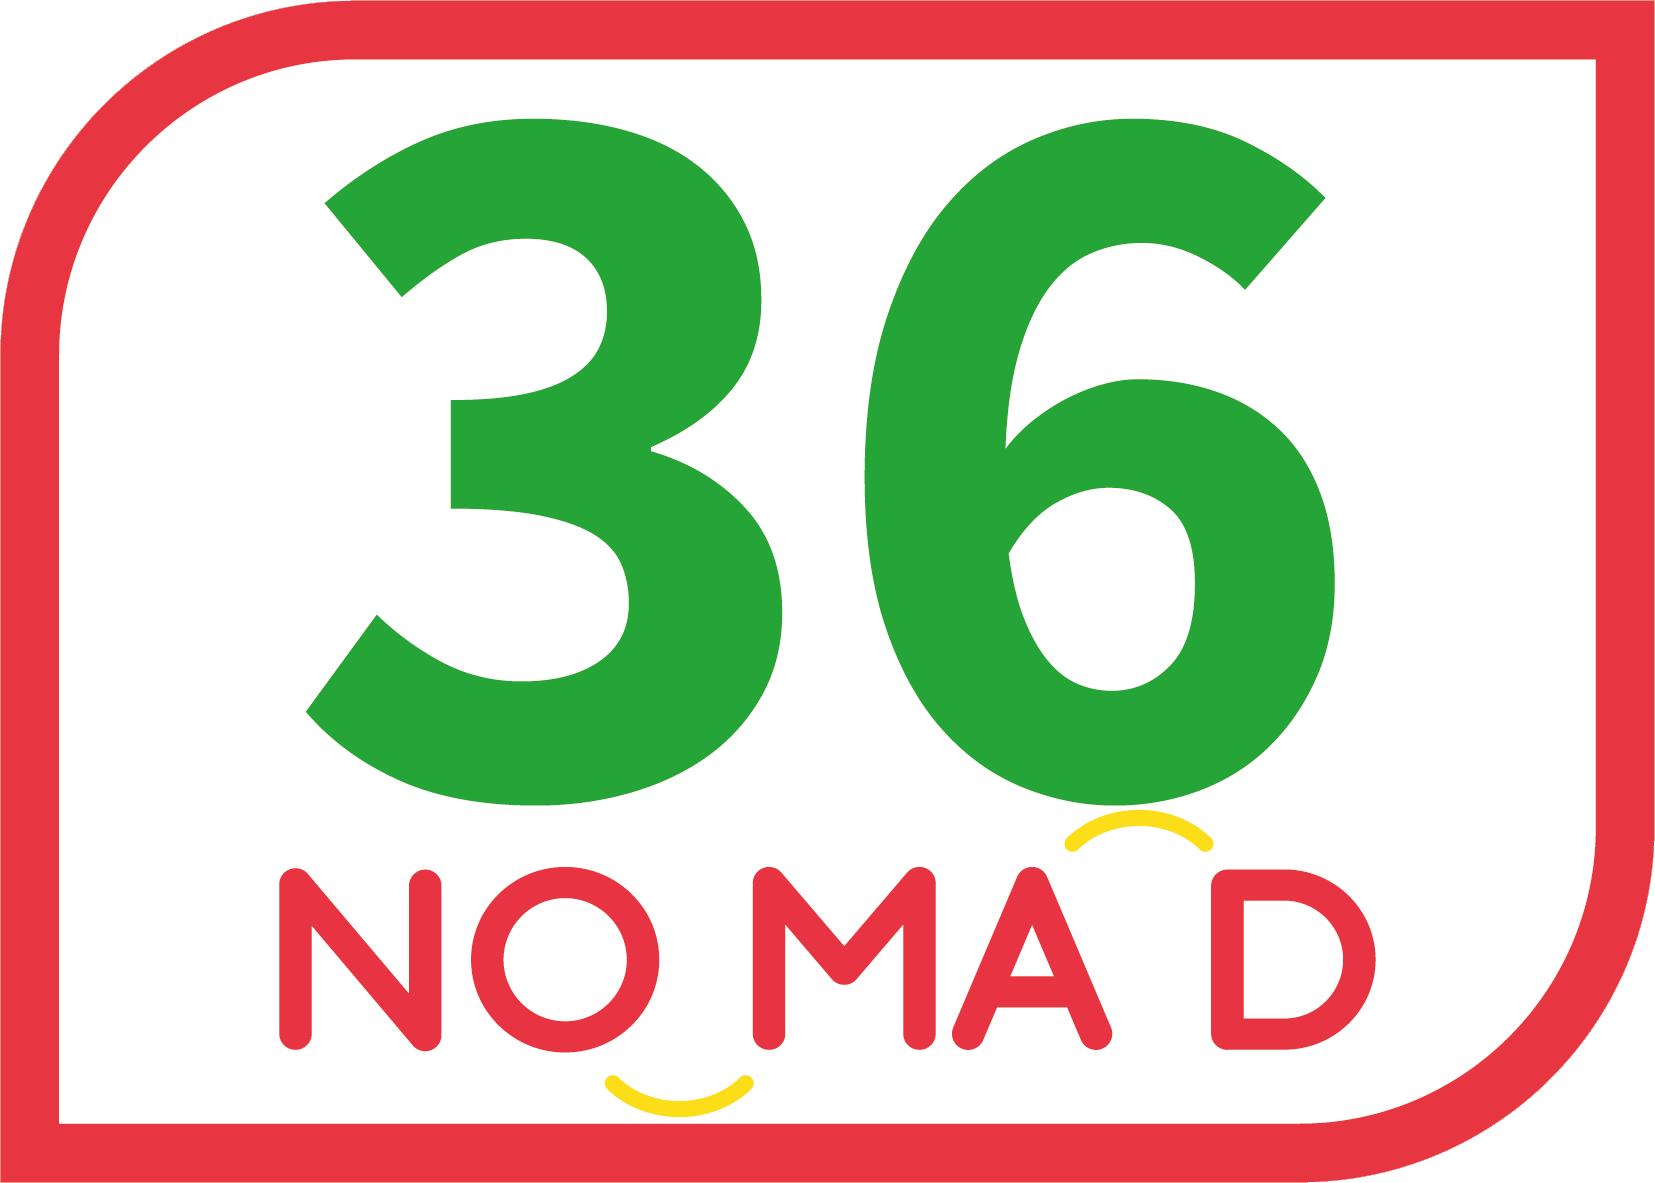 Ligne Nomad 36